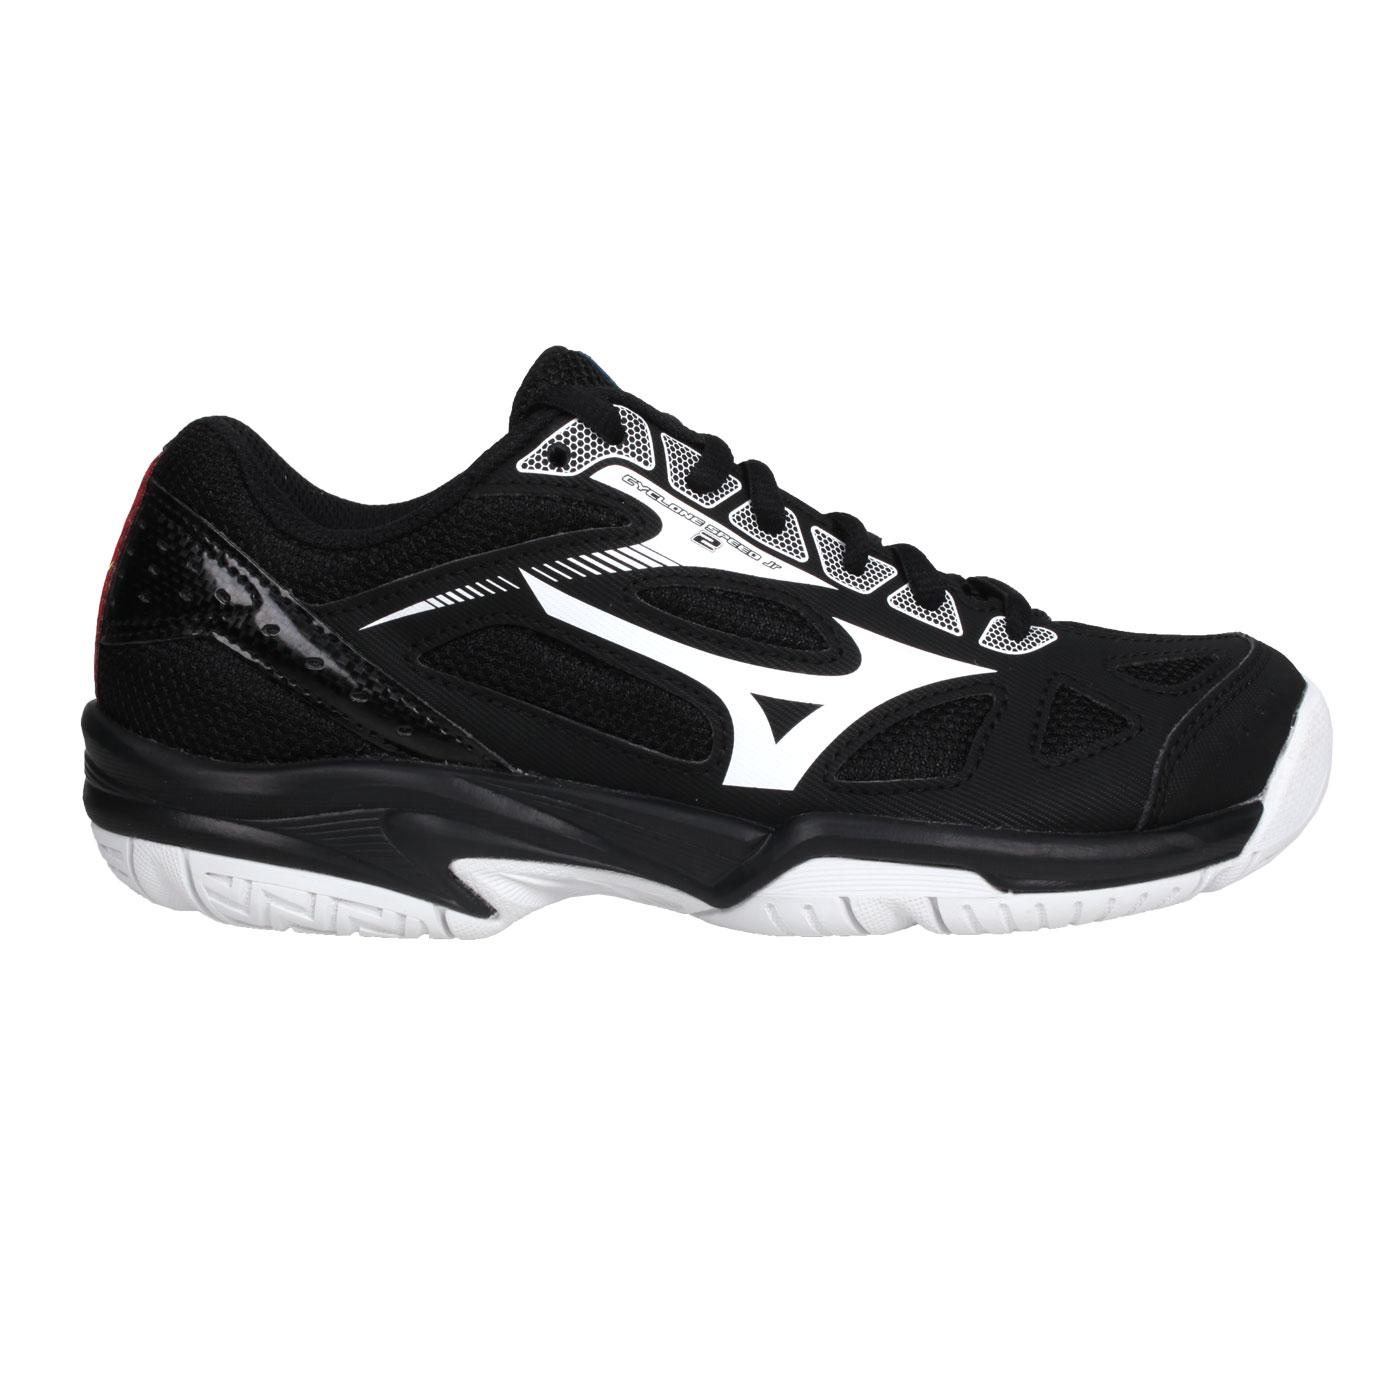 MIZUNO 兒童排球鞋  @CYCLONE SPEED 2 Jr.@V1GD191020 - 黑白紅藍